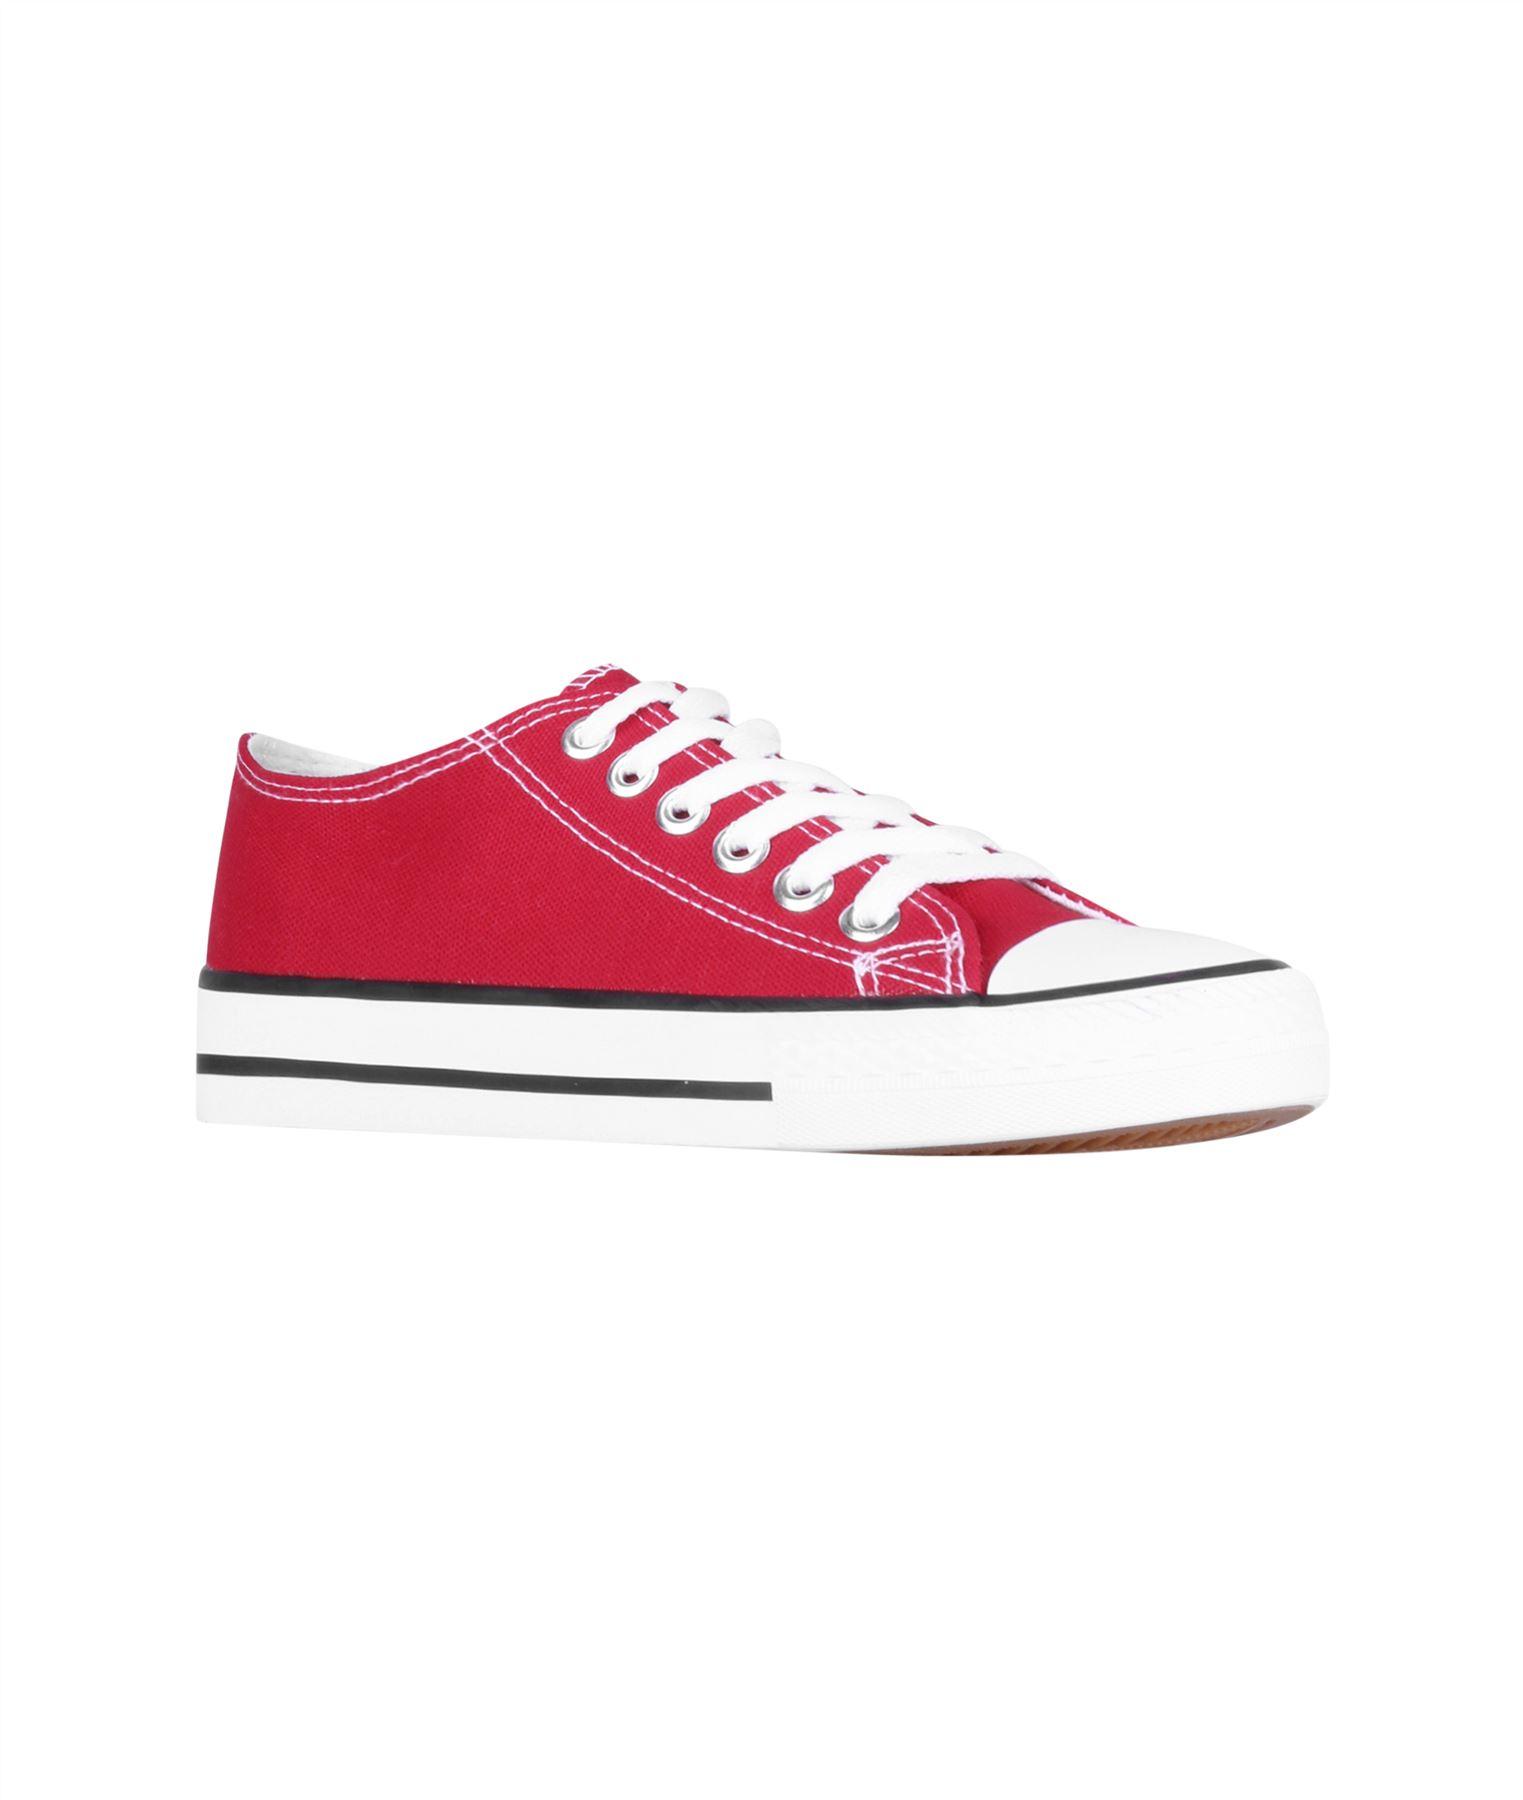 Zapatillas-Mujer-Casuales-Deportiva-Barata-Lona-Moda-Originales-Outlet-Tela-Moda miniatura 37